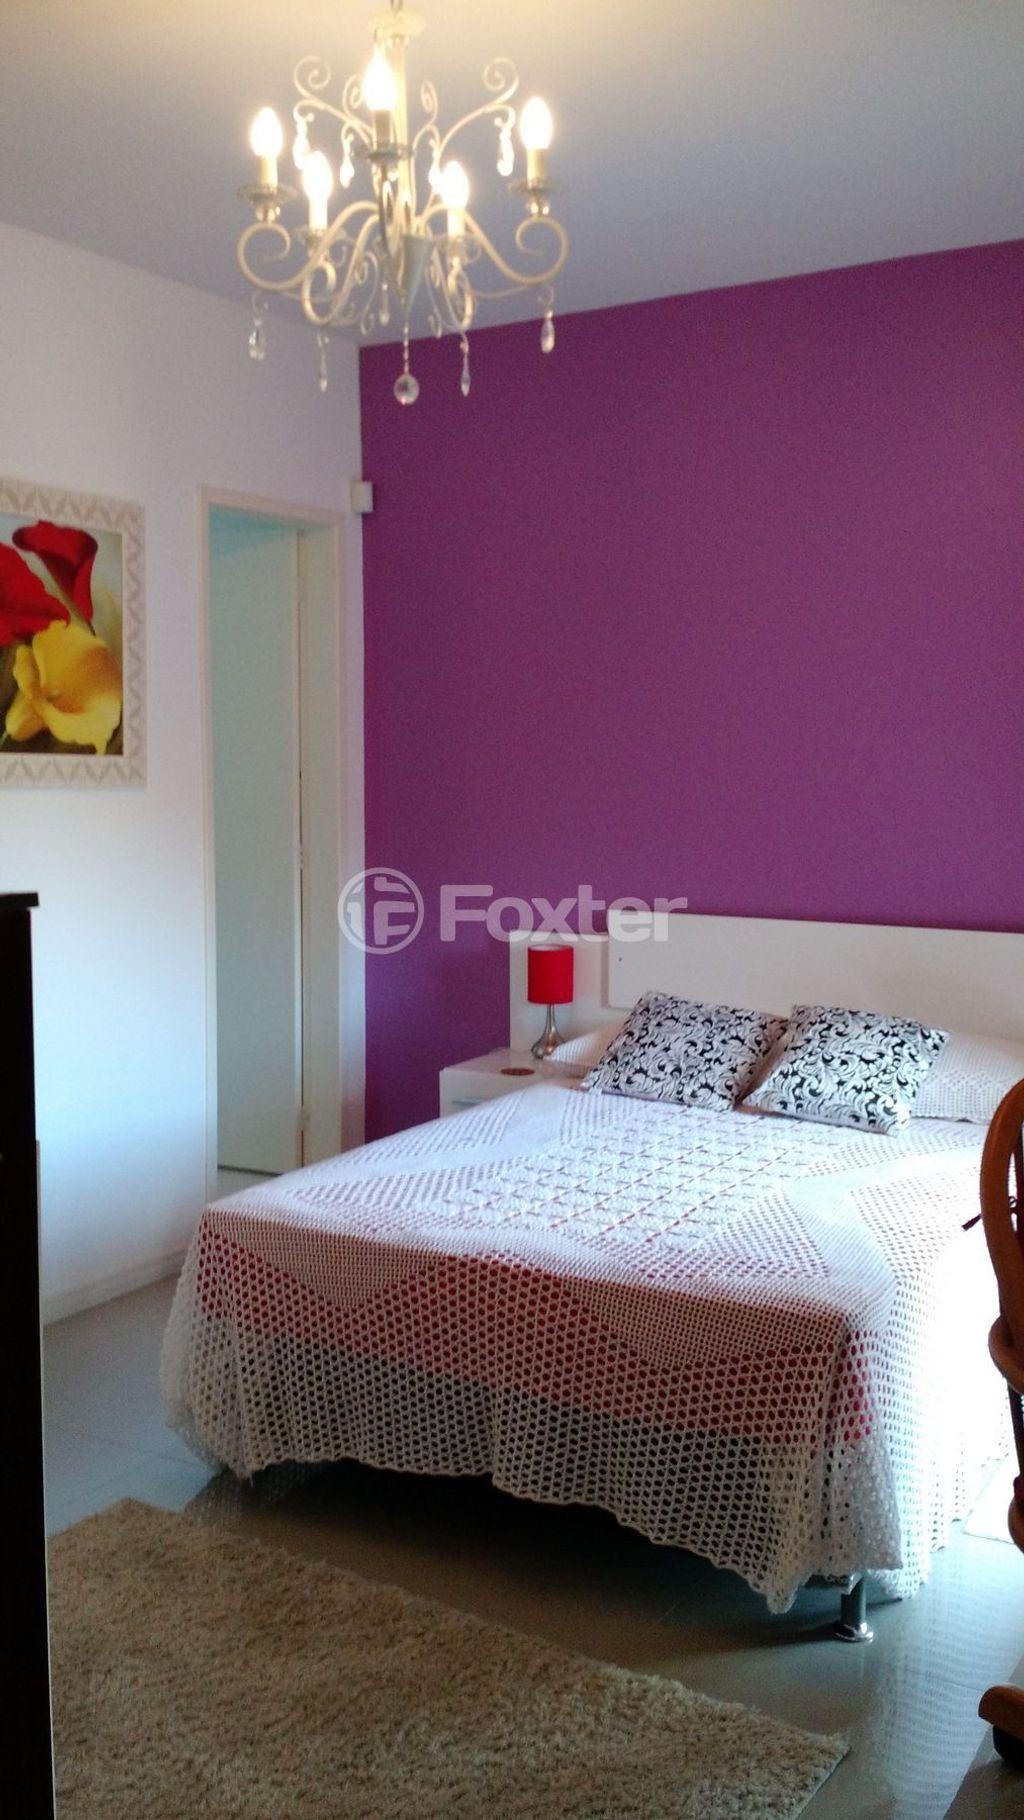 Foxter Imobiliária - Terreno 4 Dorm, Vila Nova - Foto 5